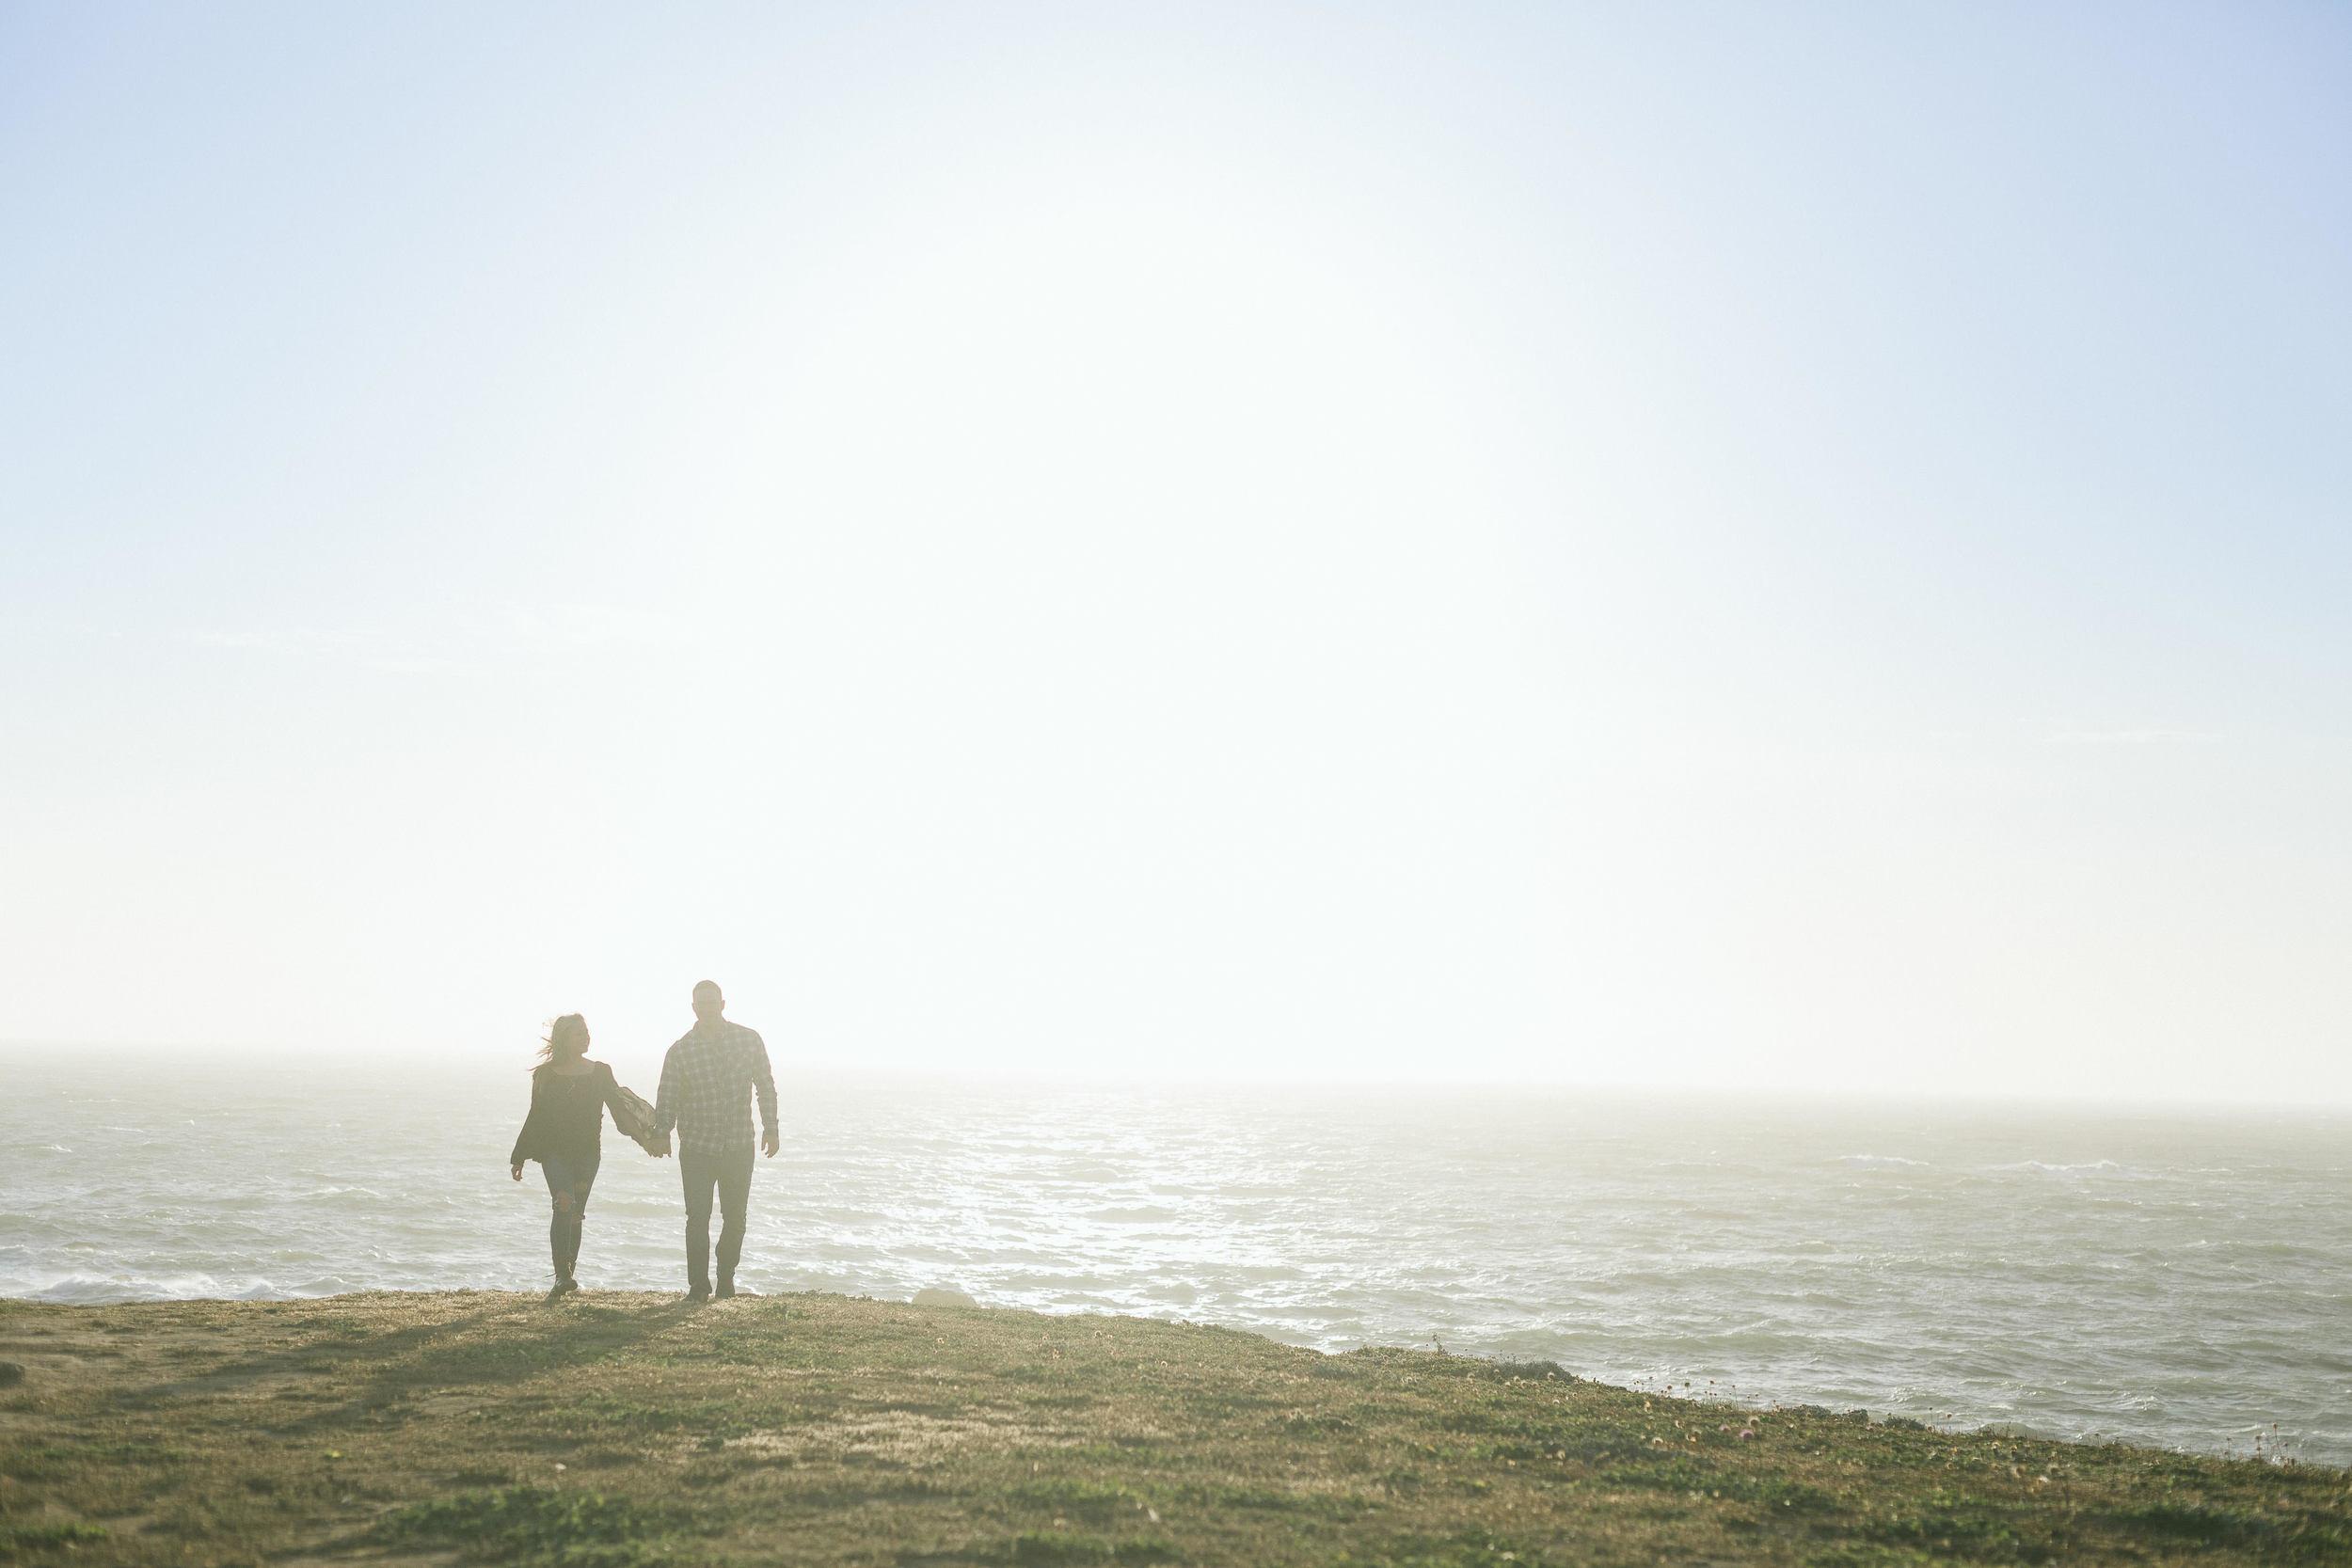 beach-couple-walking-ocean